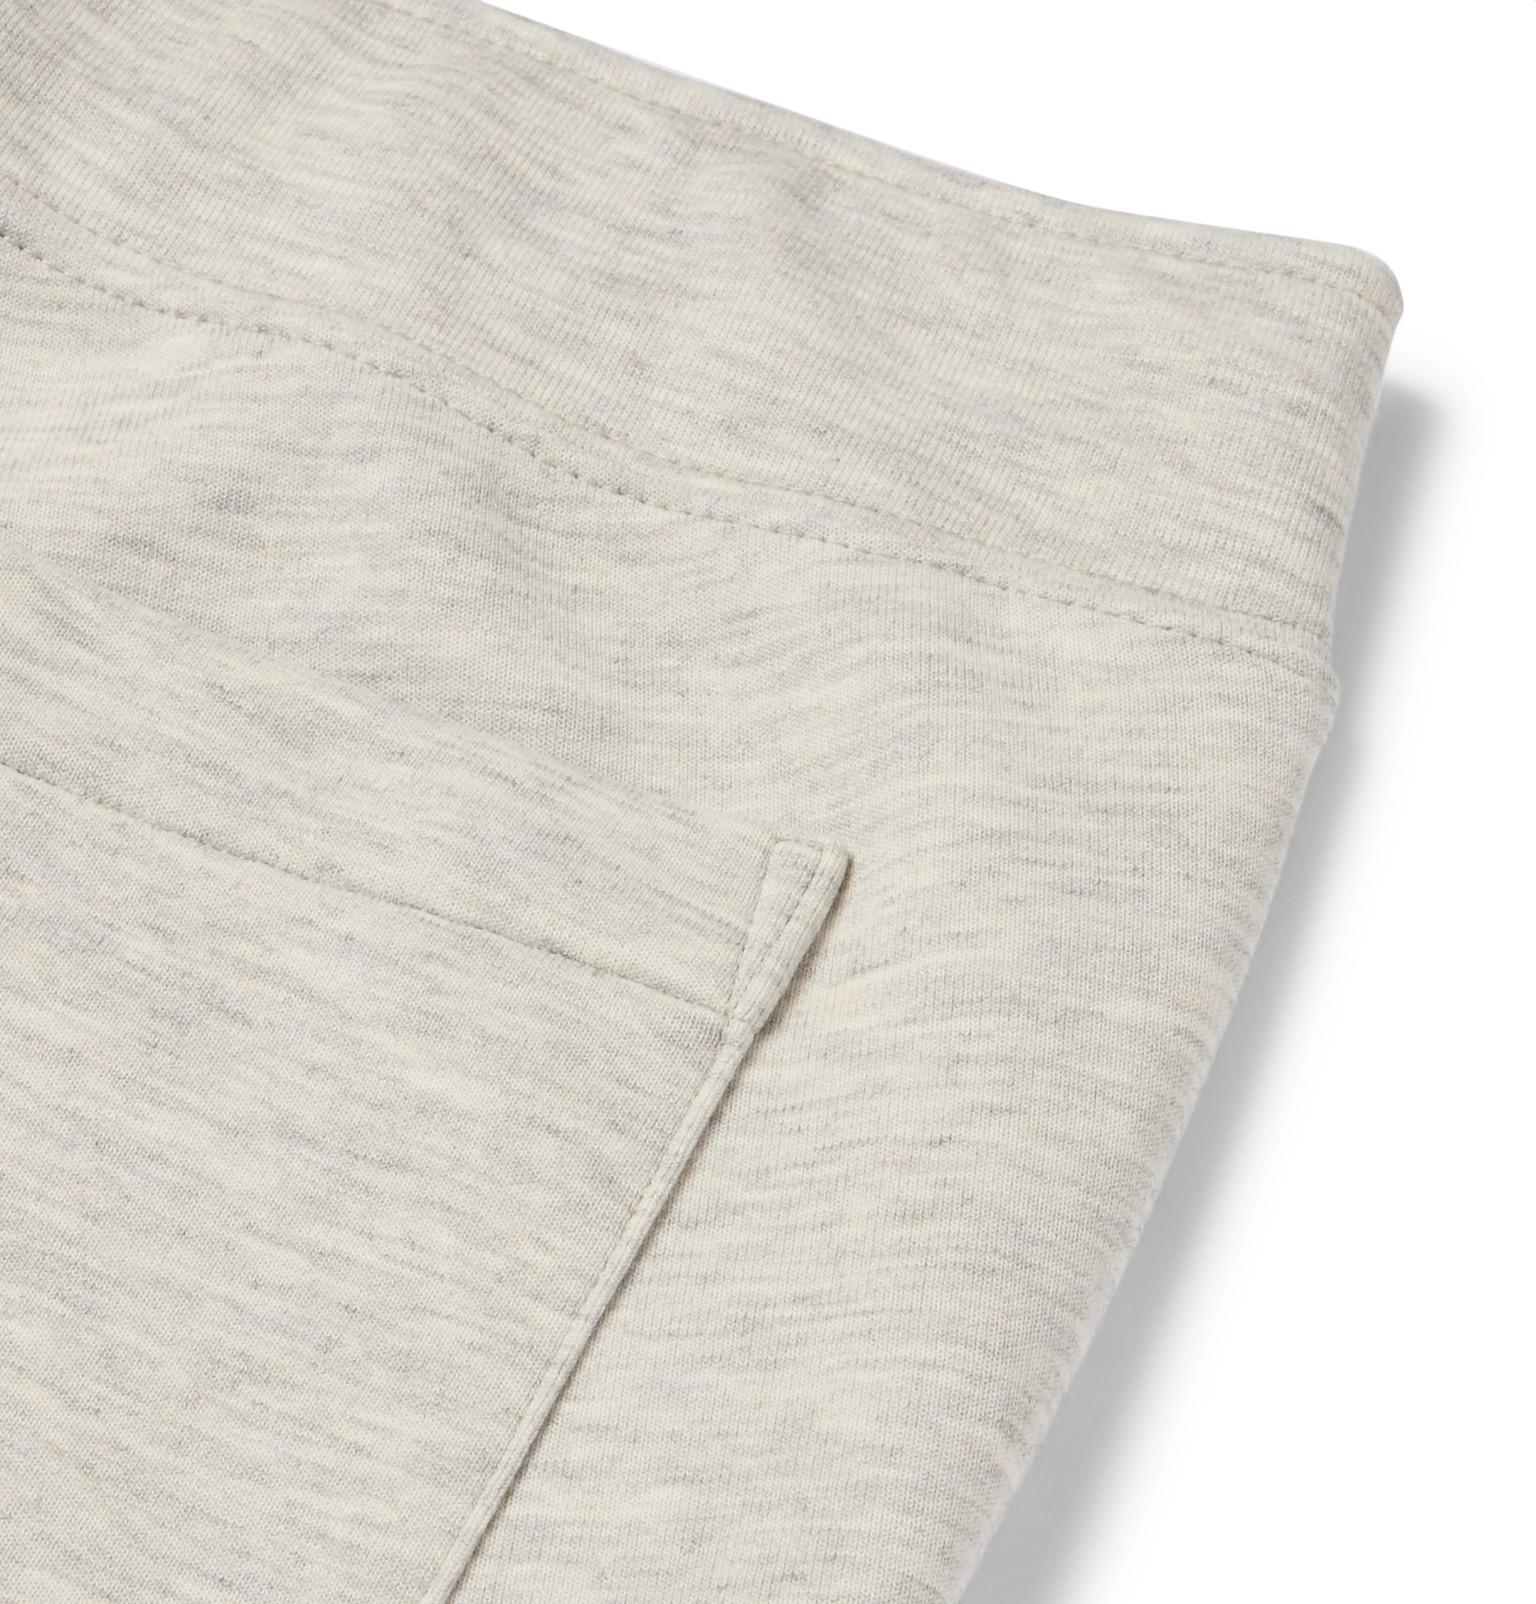 f747609a0227 Polo Ralph Lauren - Slim-Fit Mélange Tapered Jersey Sweatpants